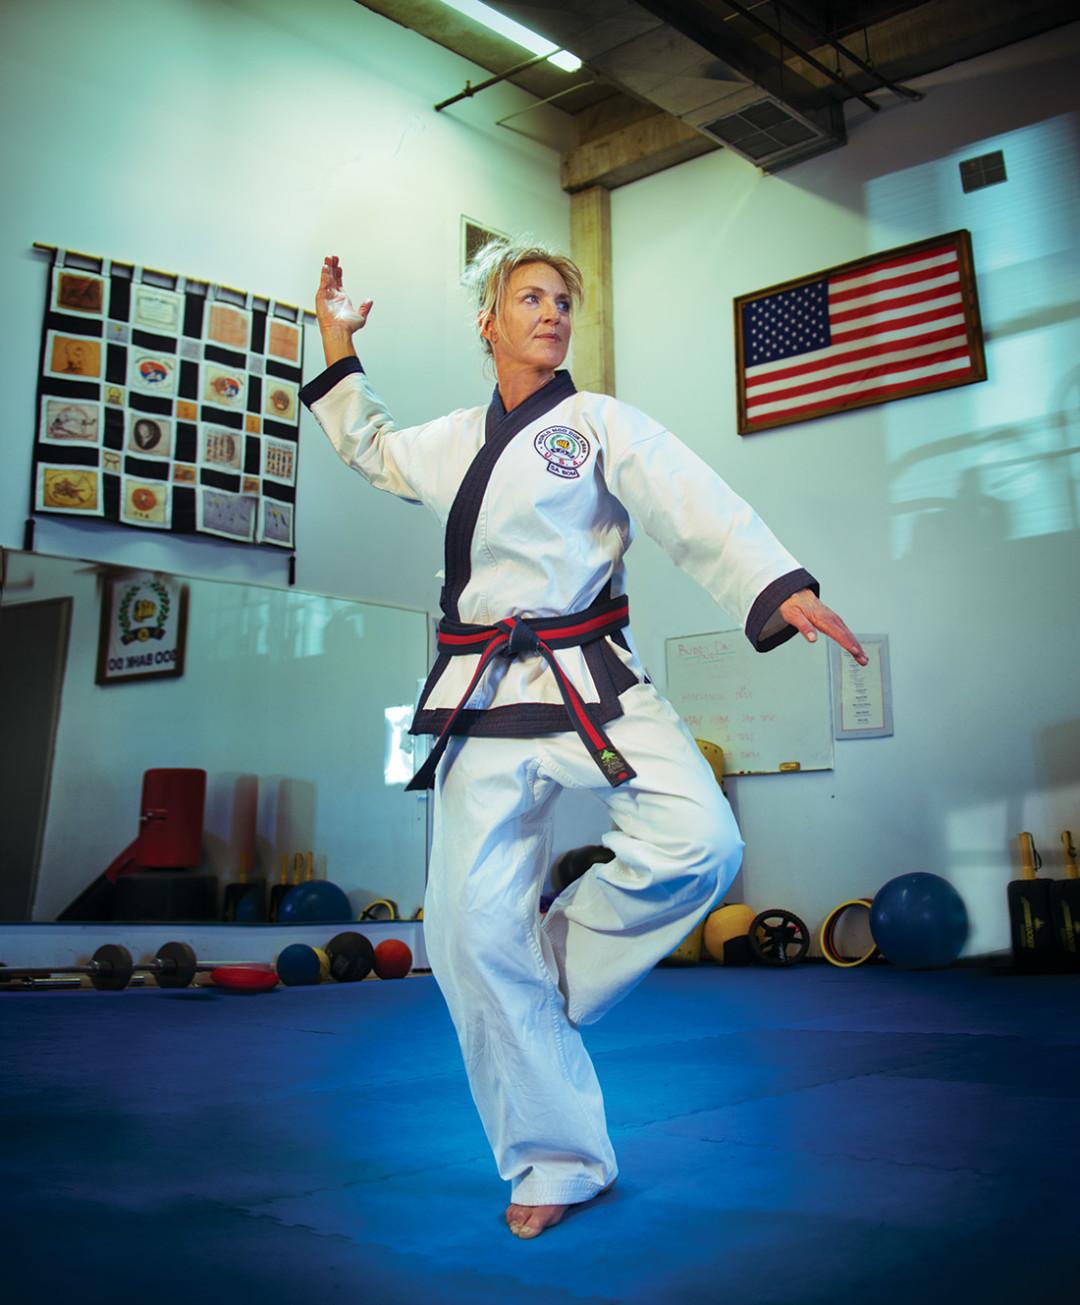 0215 belt drive karate instructor jfgnin